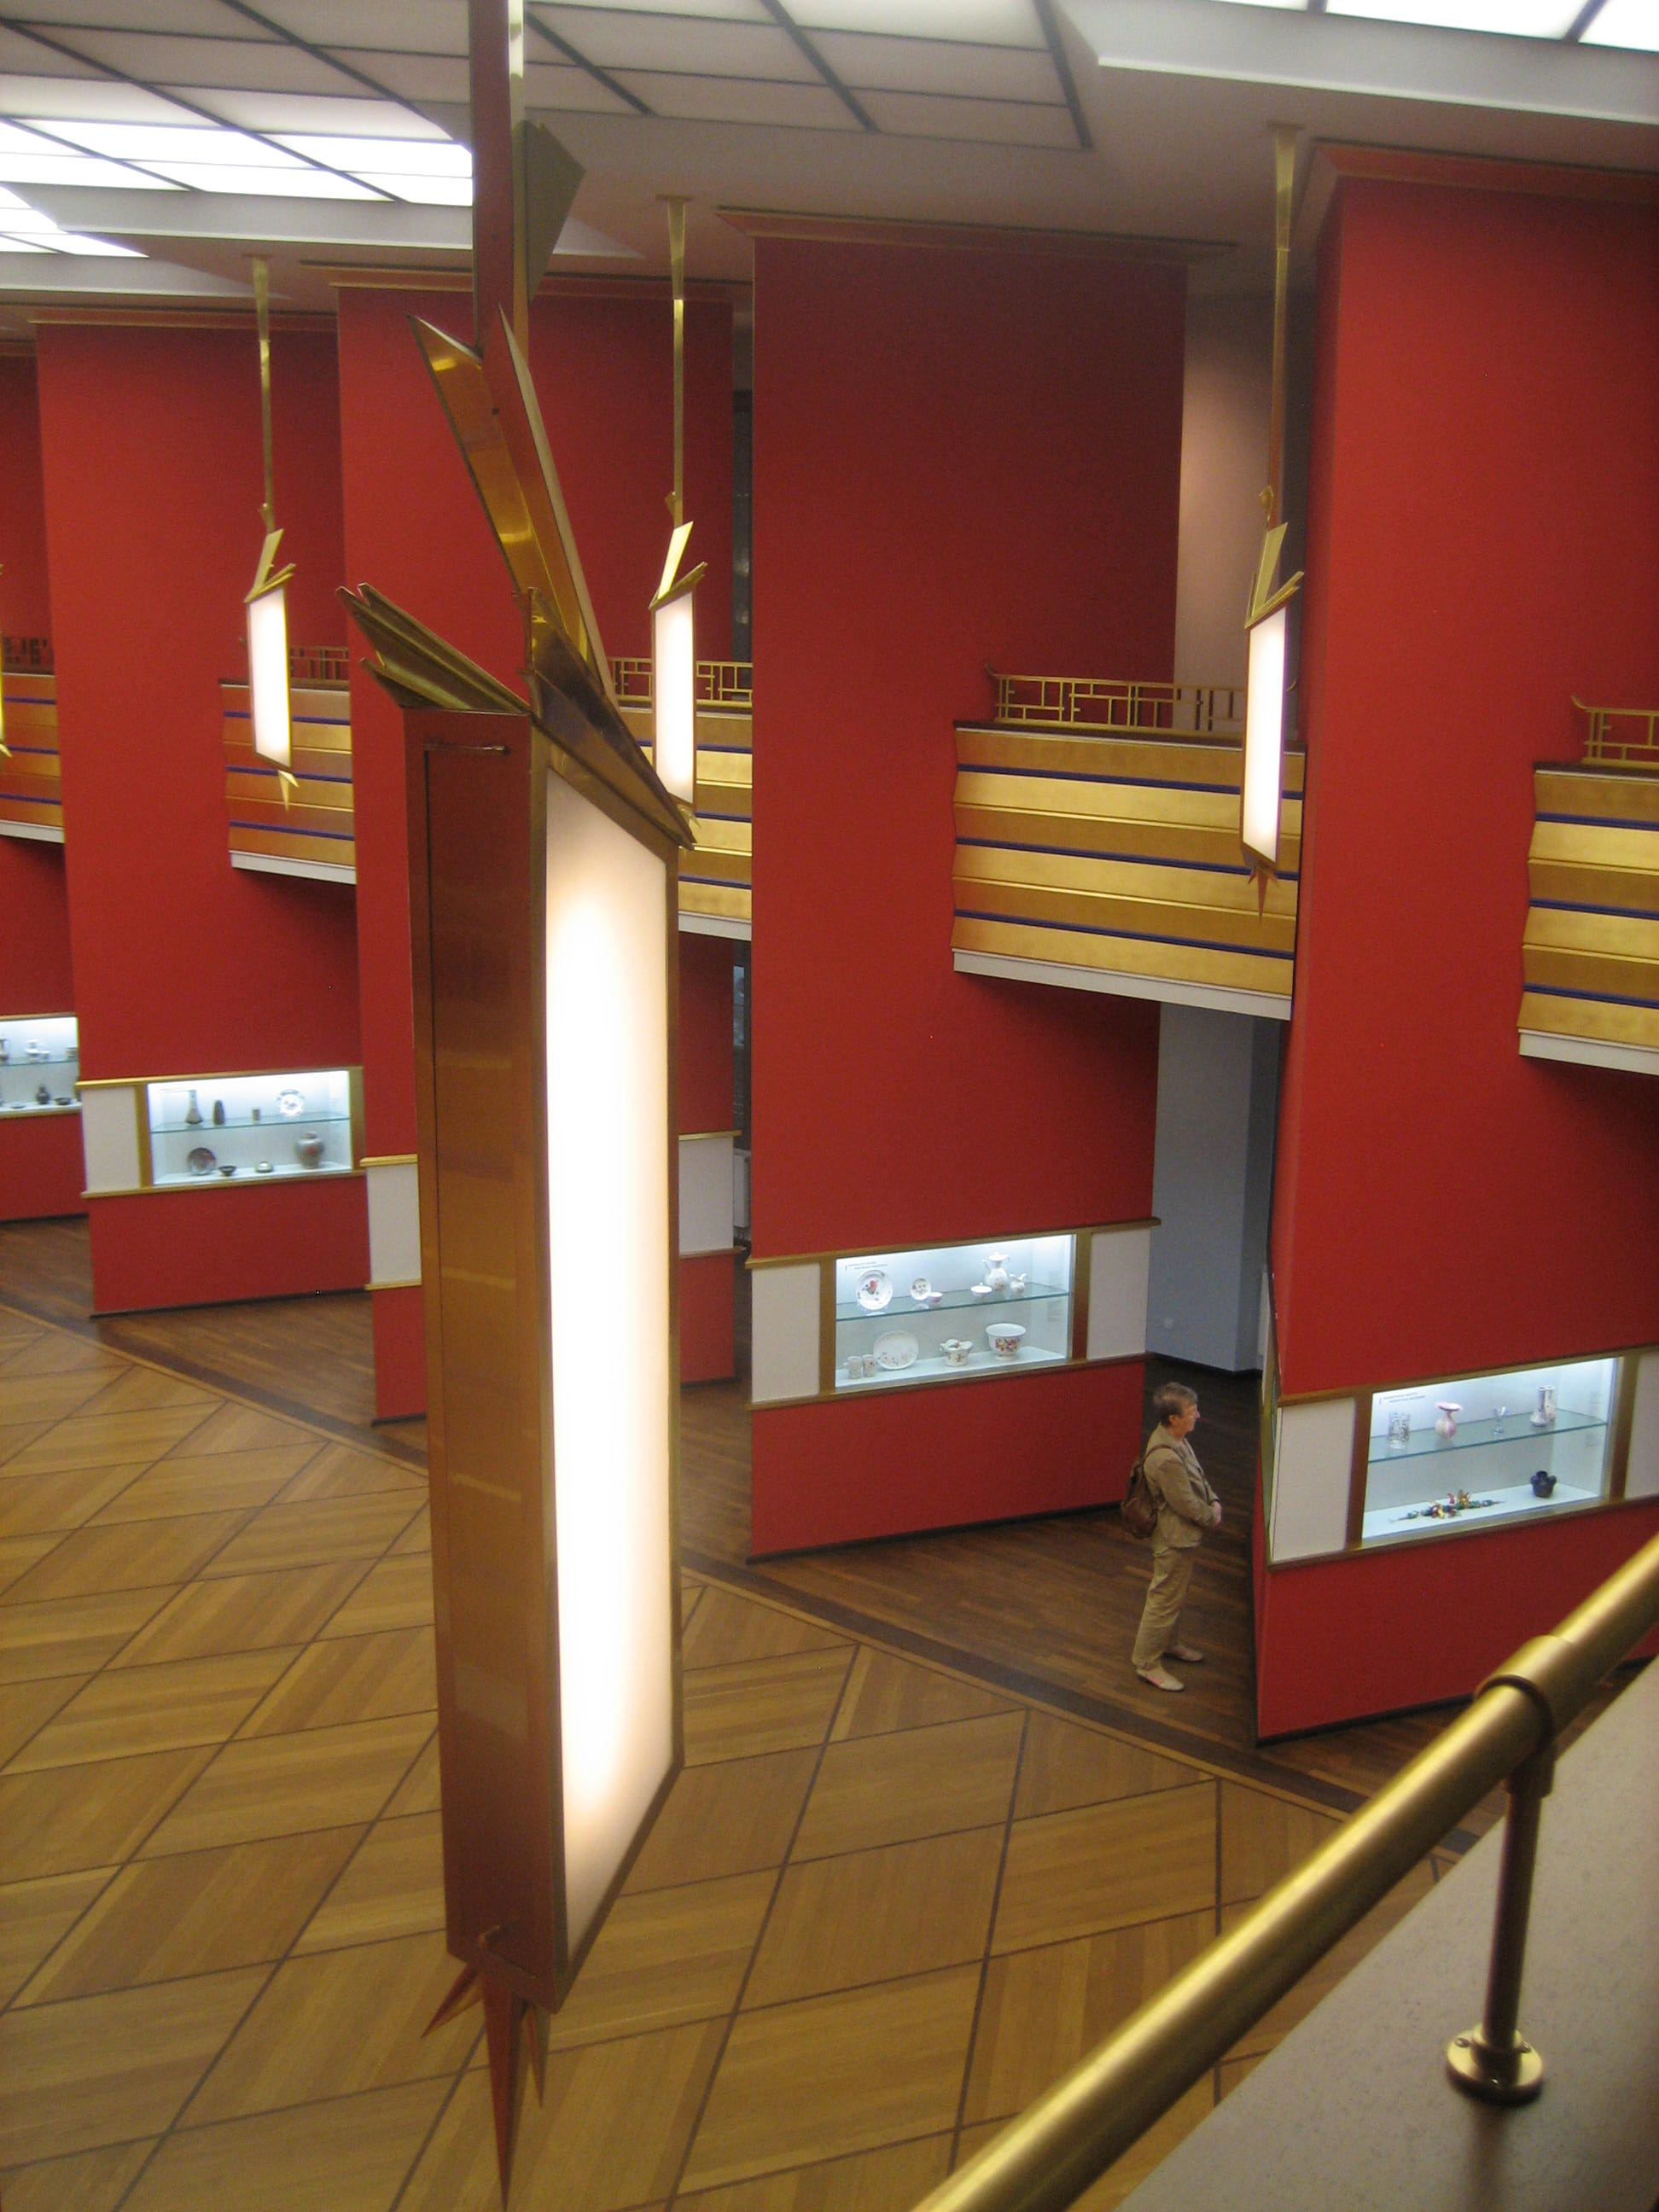 Grassimuseum. Foto Esther Doornbusch, mei 2018, CC BY 4.0